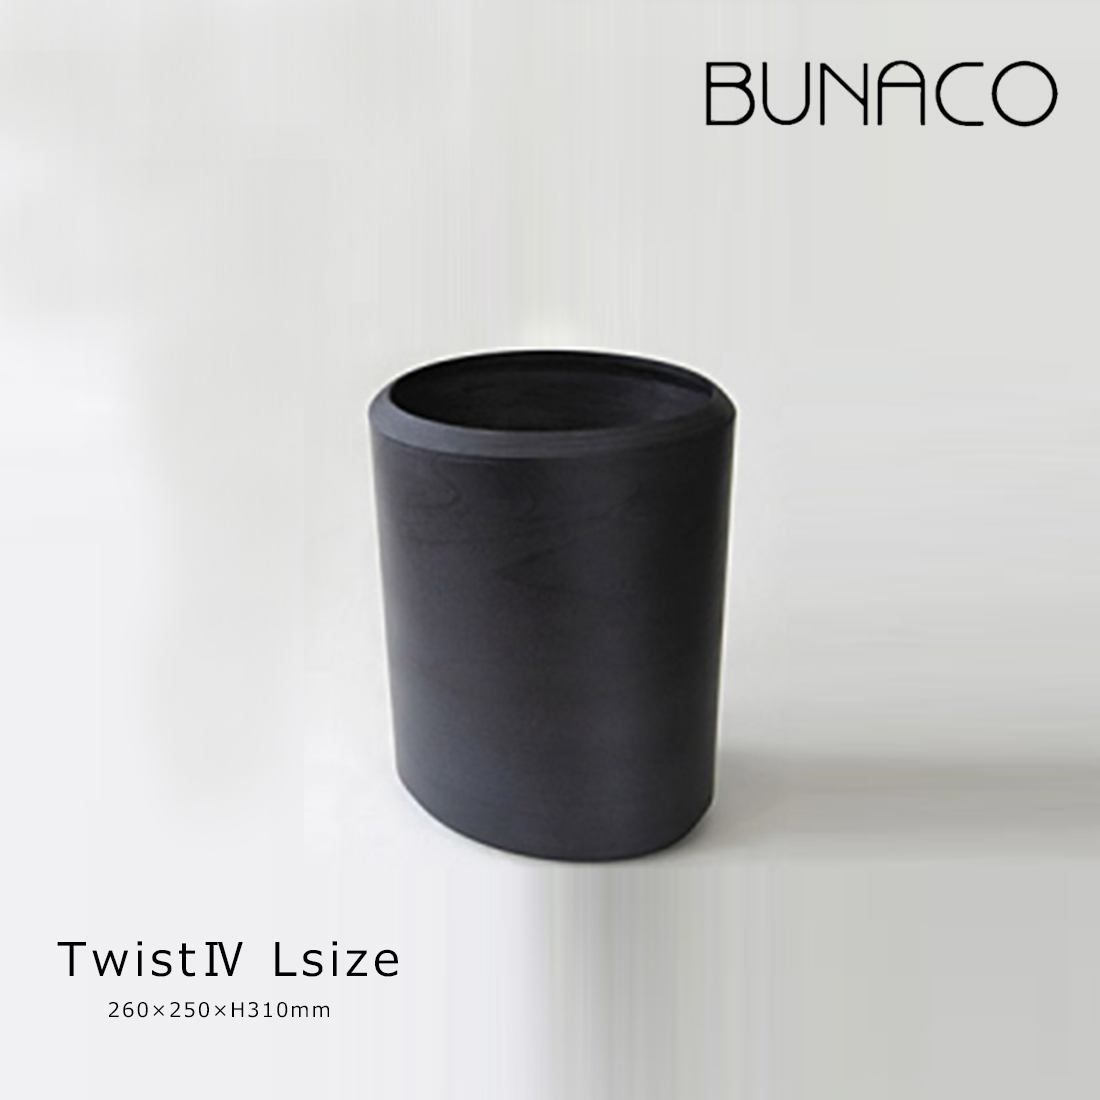 【BUNACO/ブナコ】 Dust Box Twist4 《Size L》ダストボックス ツイスト ゴミ箱 リビング雑貨 木工品/伝統 インテリア コンビニ受取対応